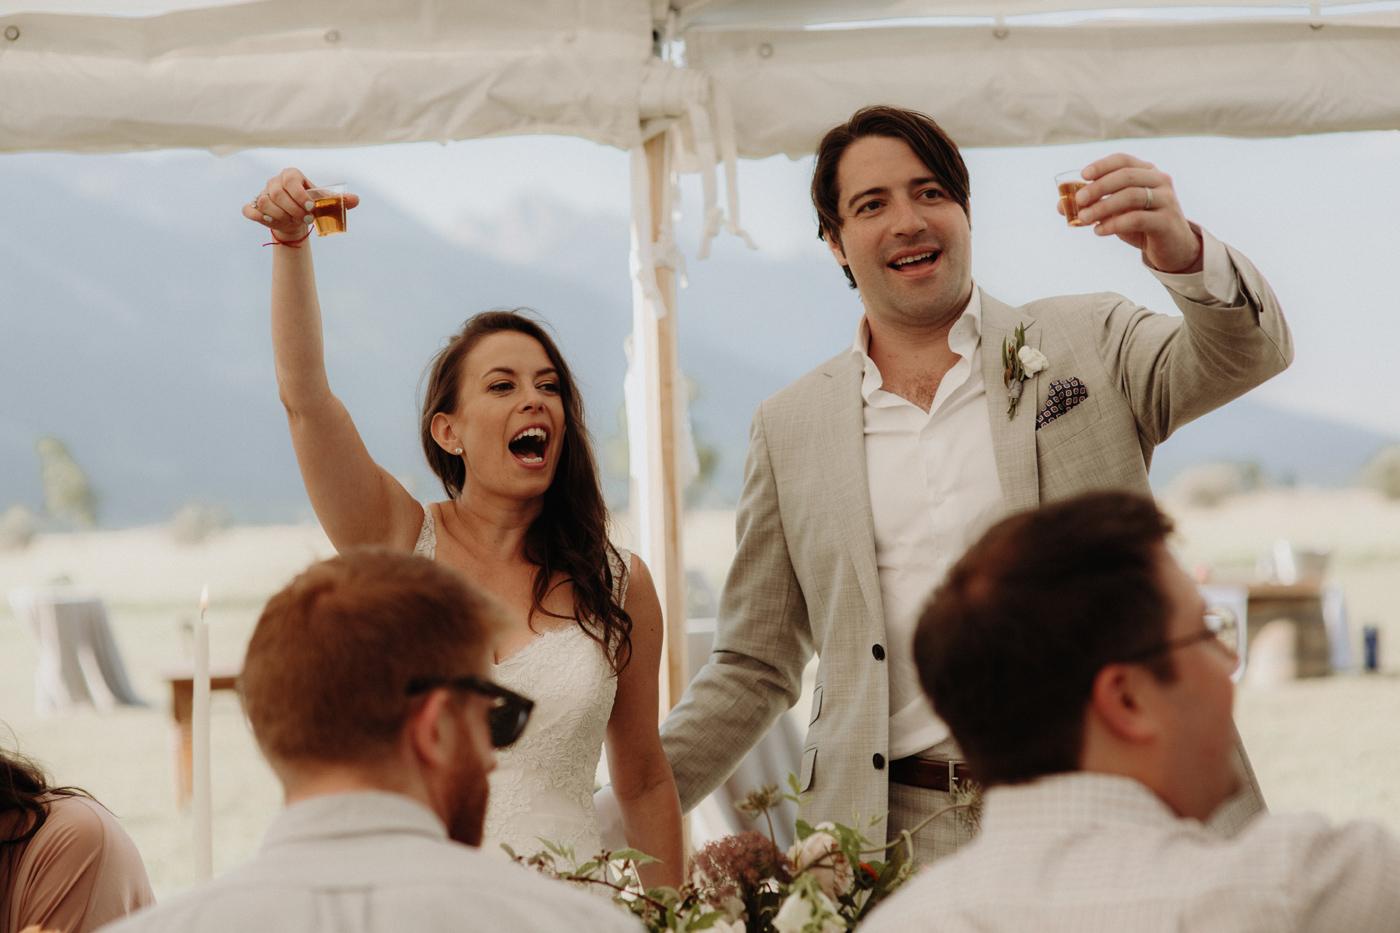 069-grand-teton-jackson-hole-wyoming-wedding.jpg